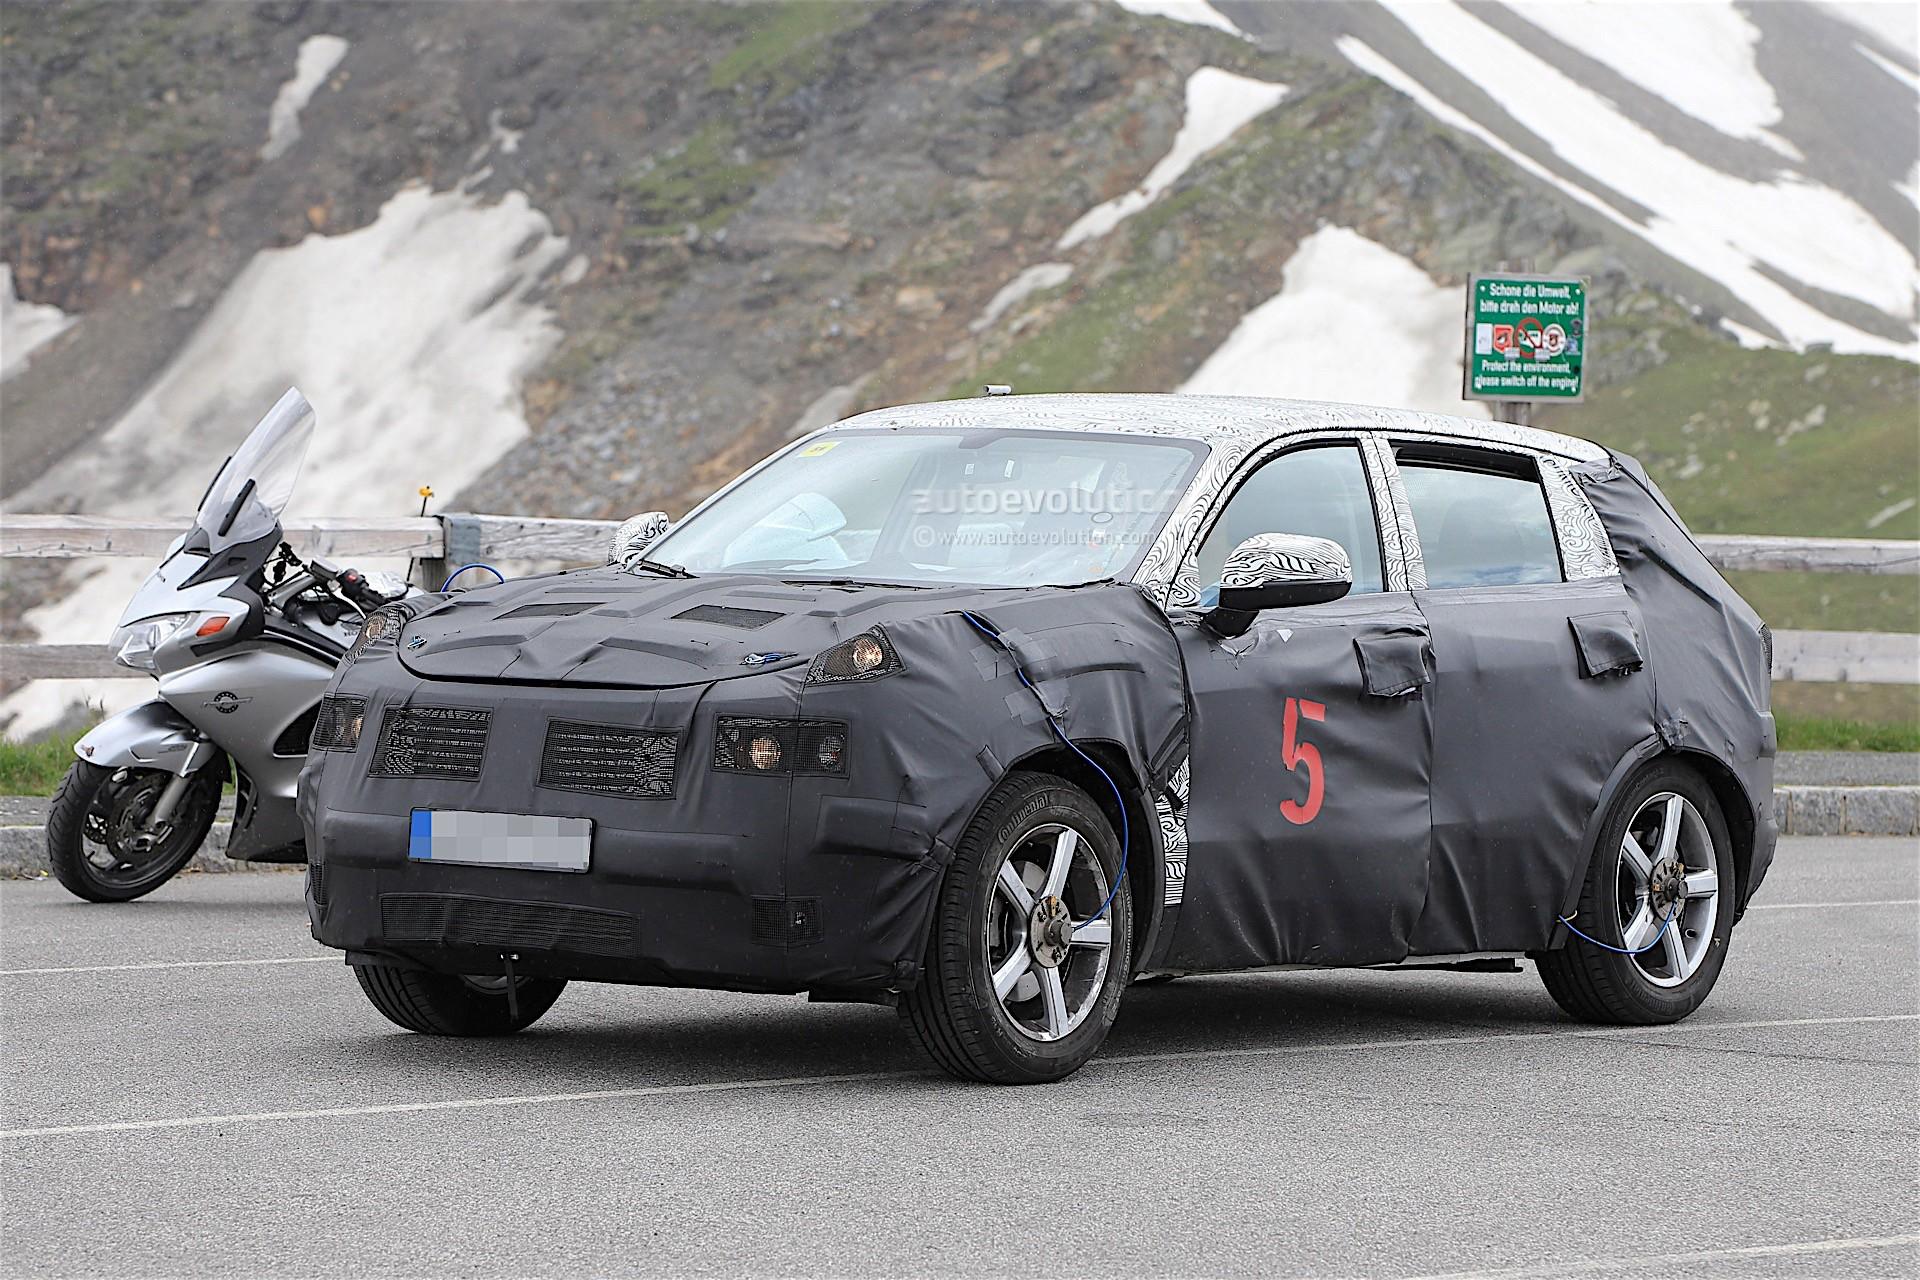 2017 - [Lynk&Co] 01 SUV Geely-suv-spy_3